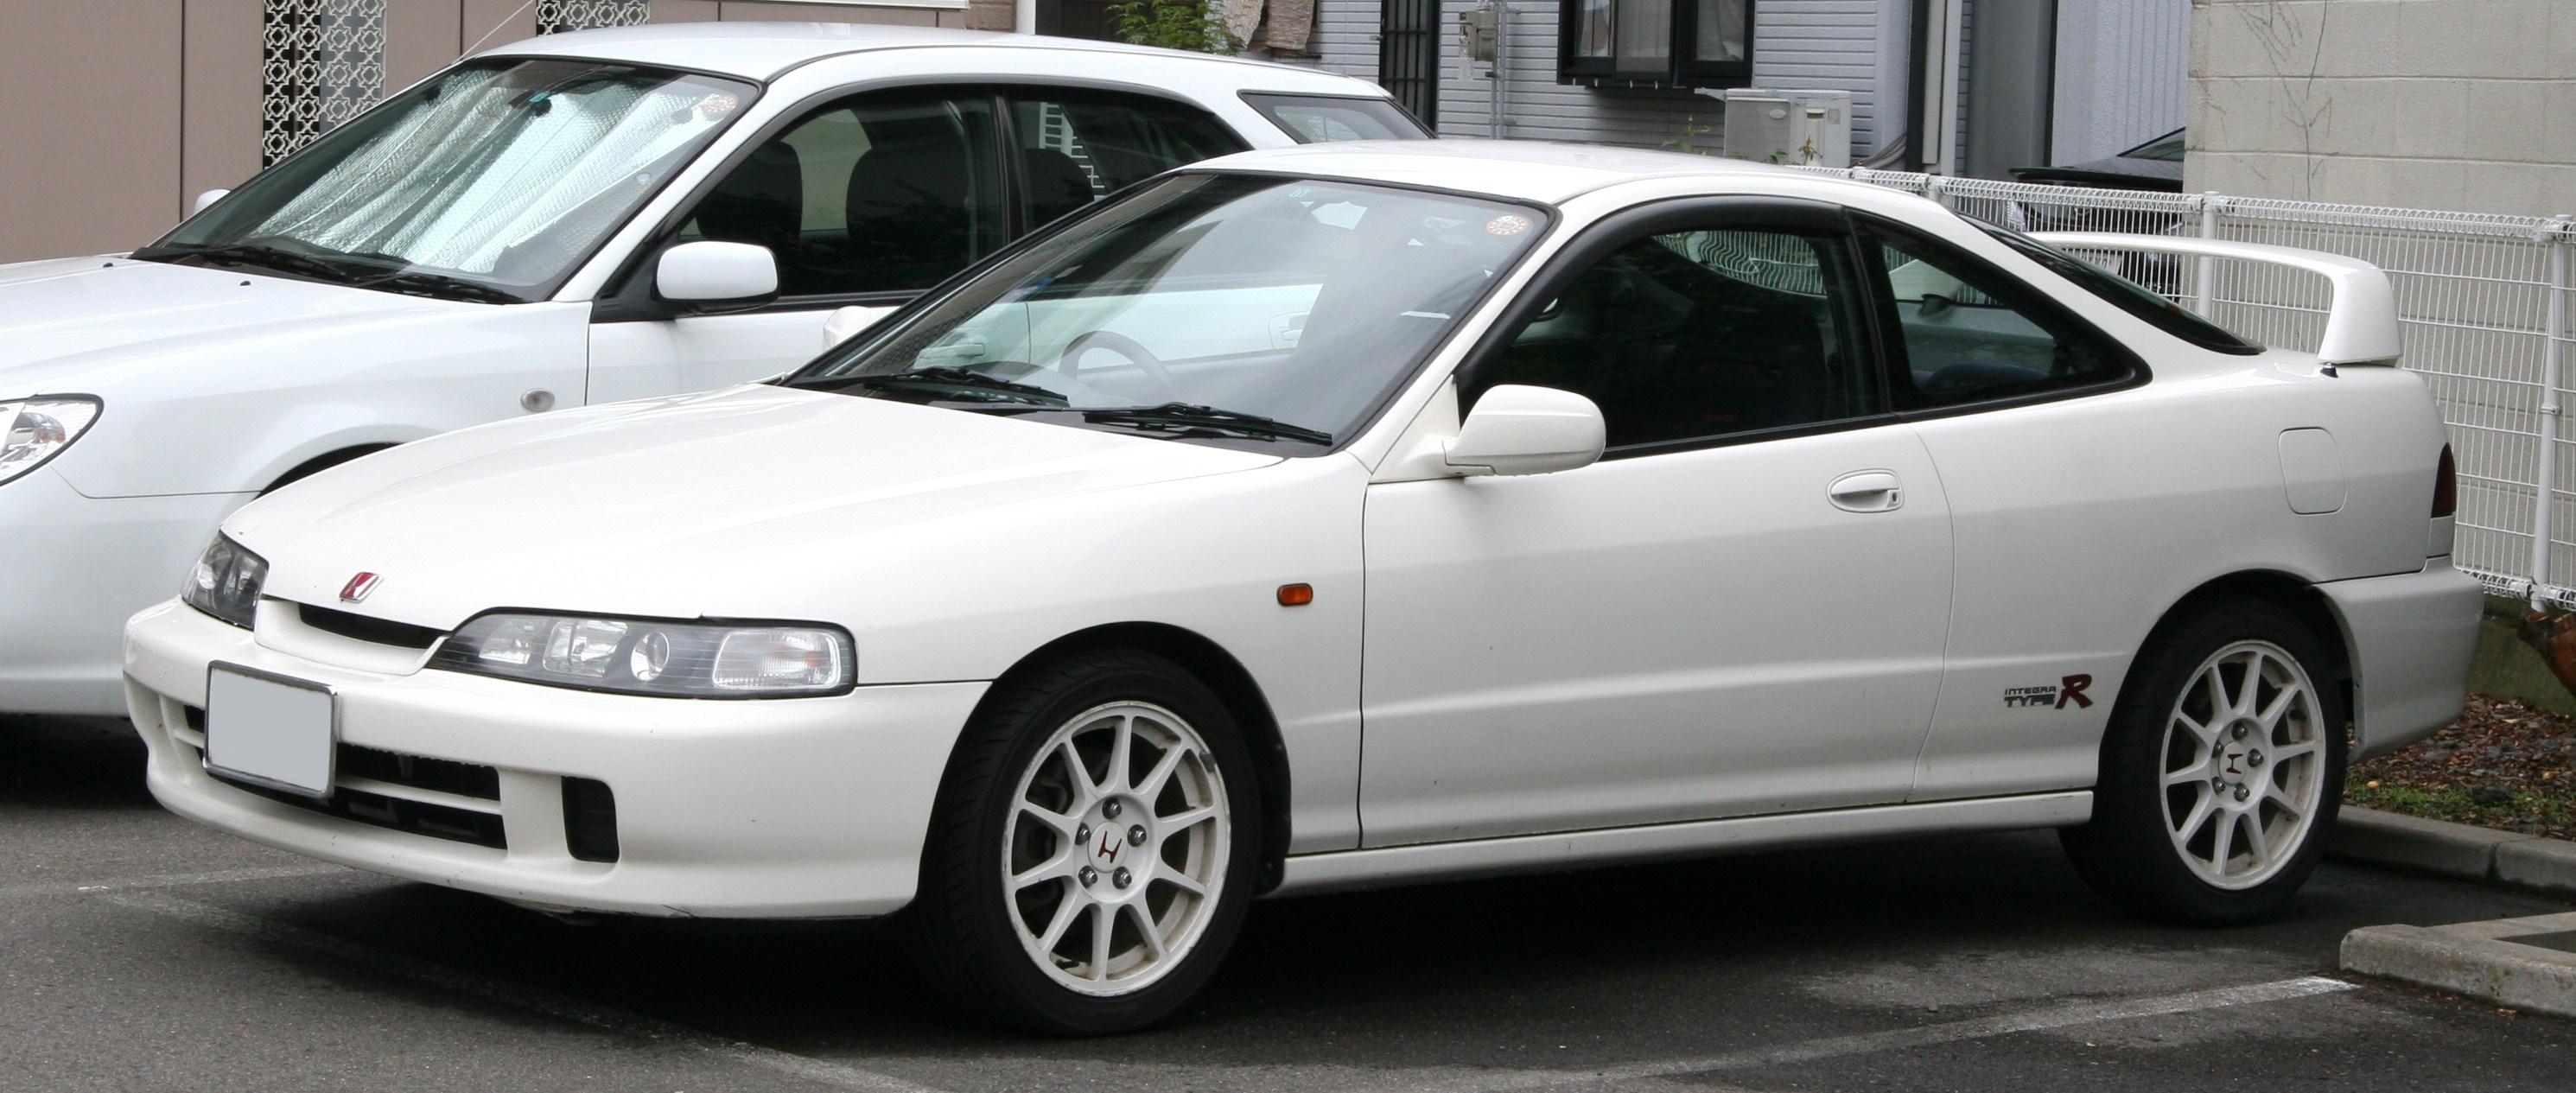 File:Honda Integra Type-R DC2.jpg - Wikimedia Commons